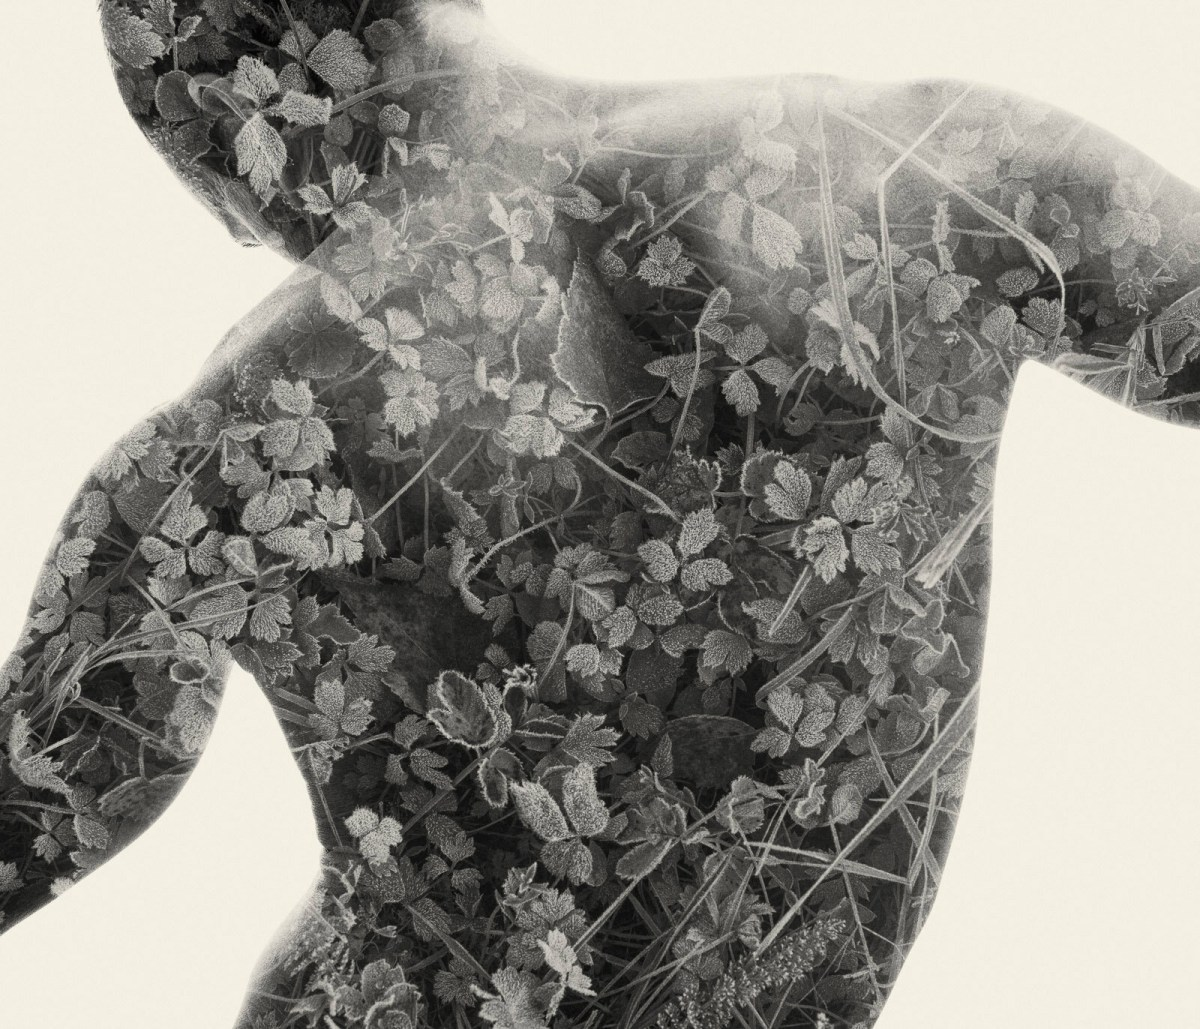 photography-christoffer-relander-04